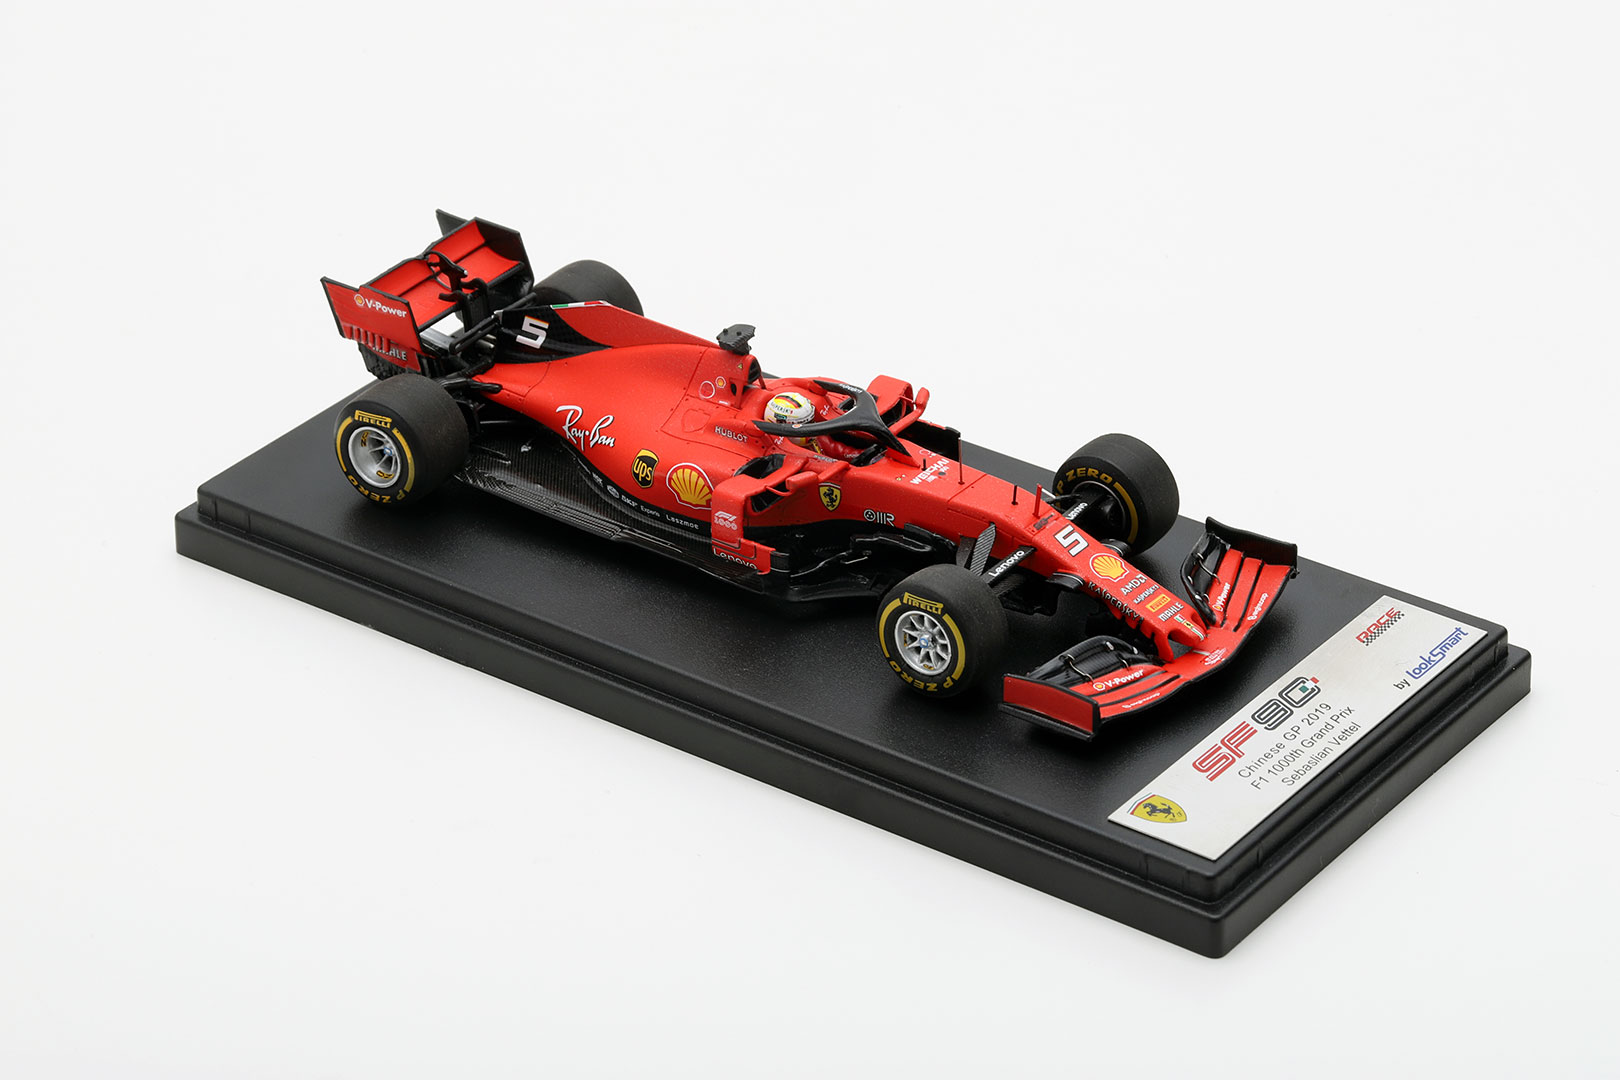 Ferrari Sf90 China Gp 2019 1000th Gp Vettel 1 43 Looksmart Models